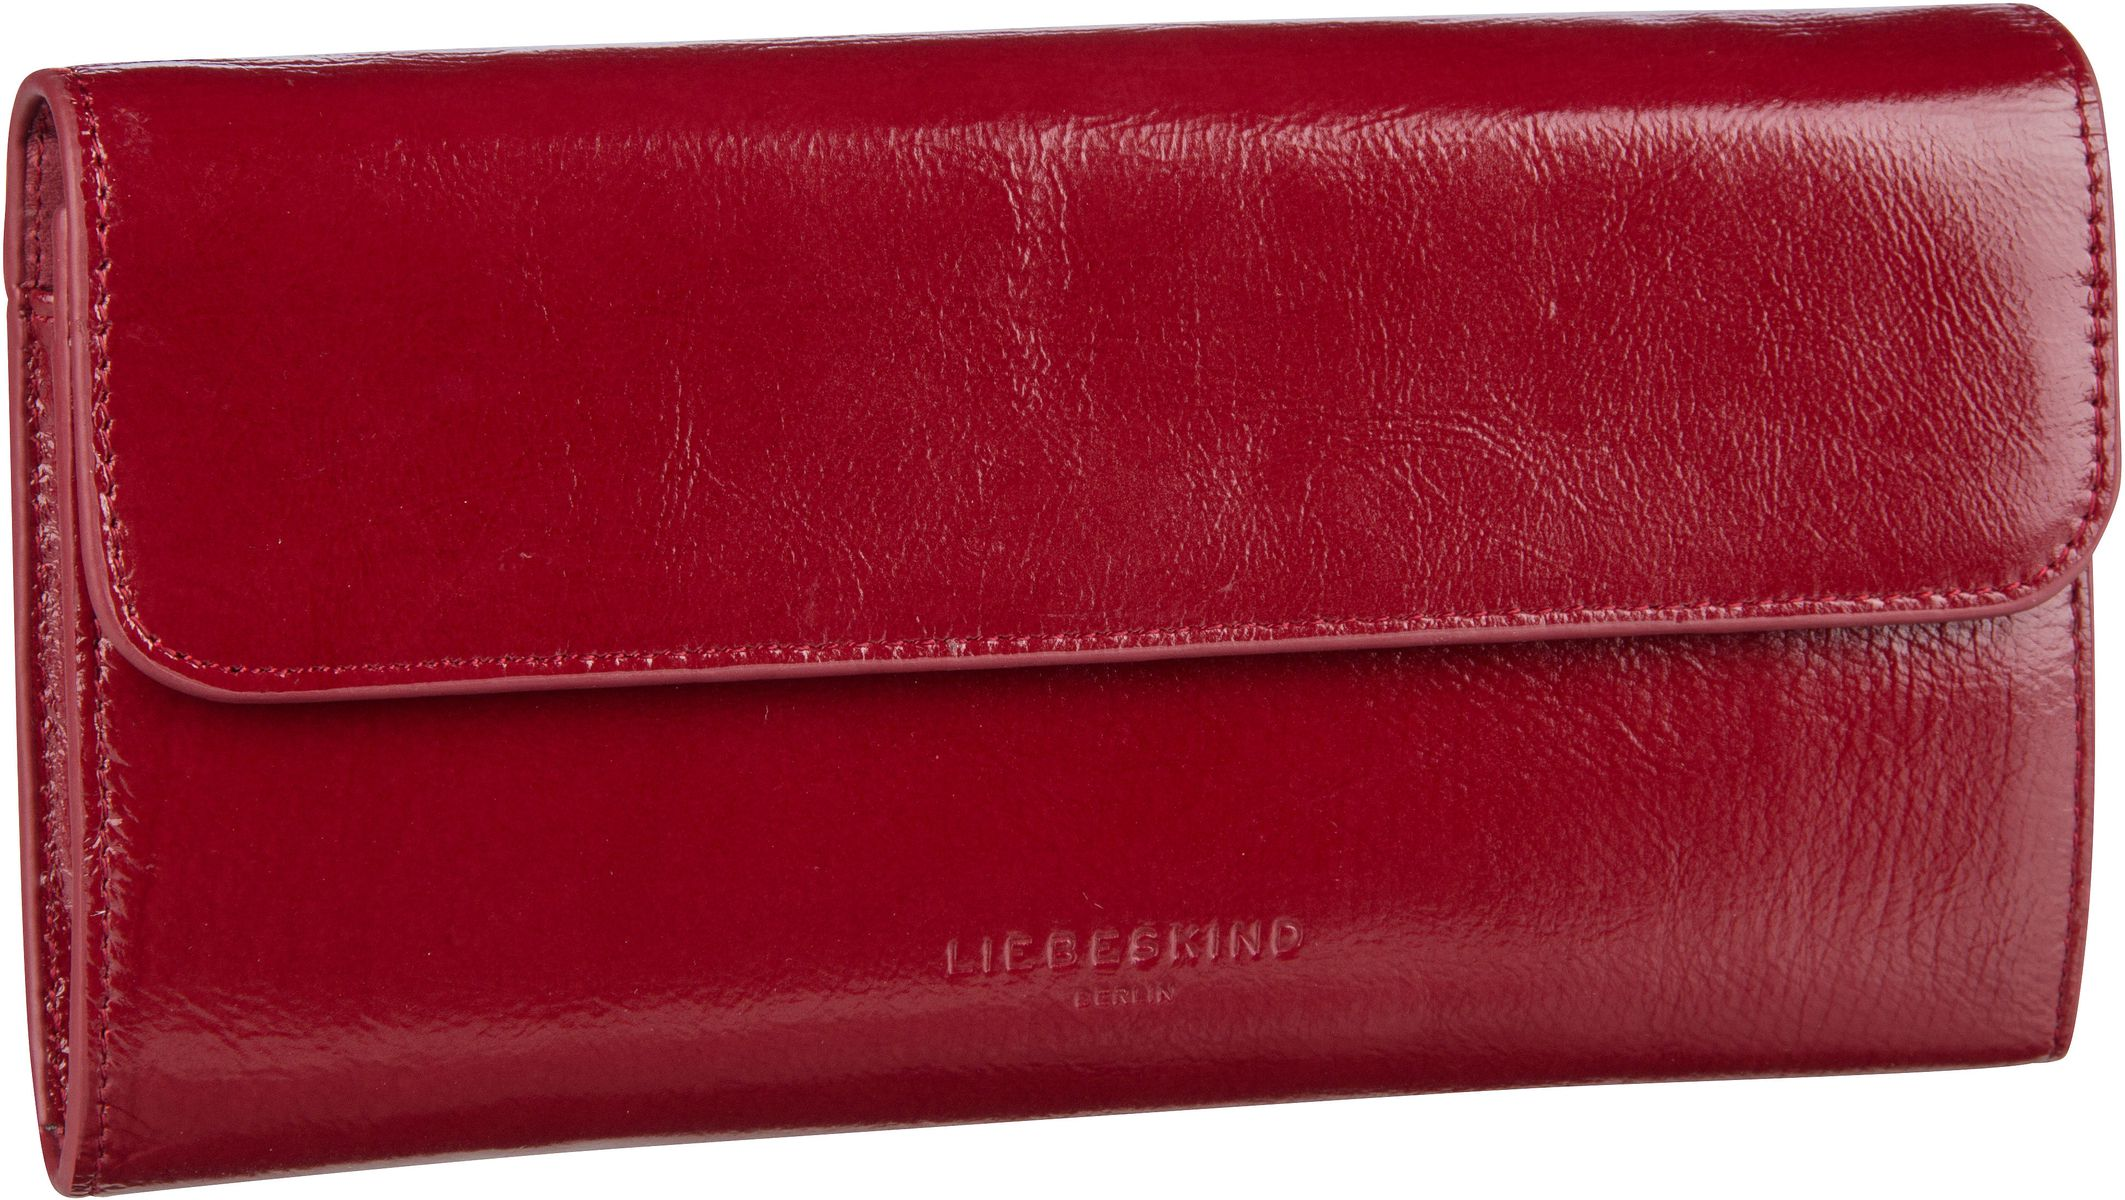 Berlin Handtasche Glossy Samantha Crossbody S Dahlia Red